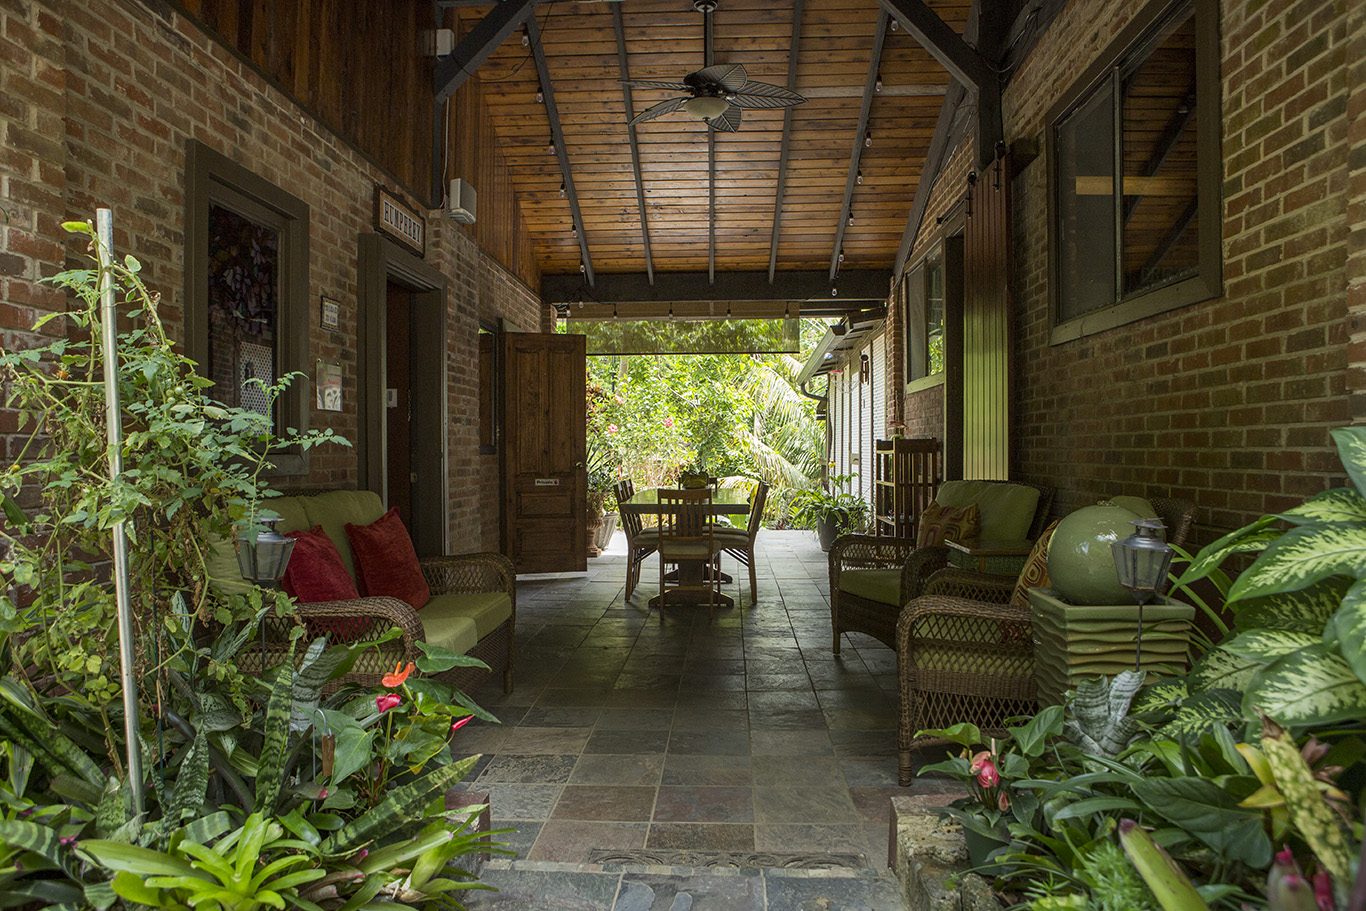 Take your breakfast in this lovely outdoor/indoor room -- The Breezeway.